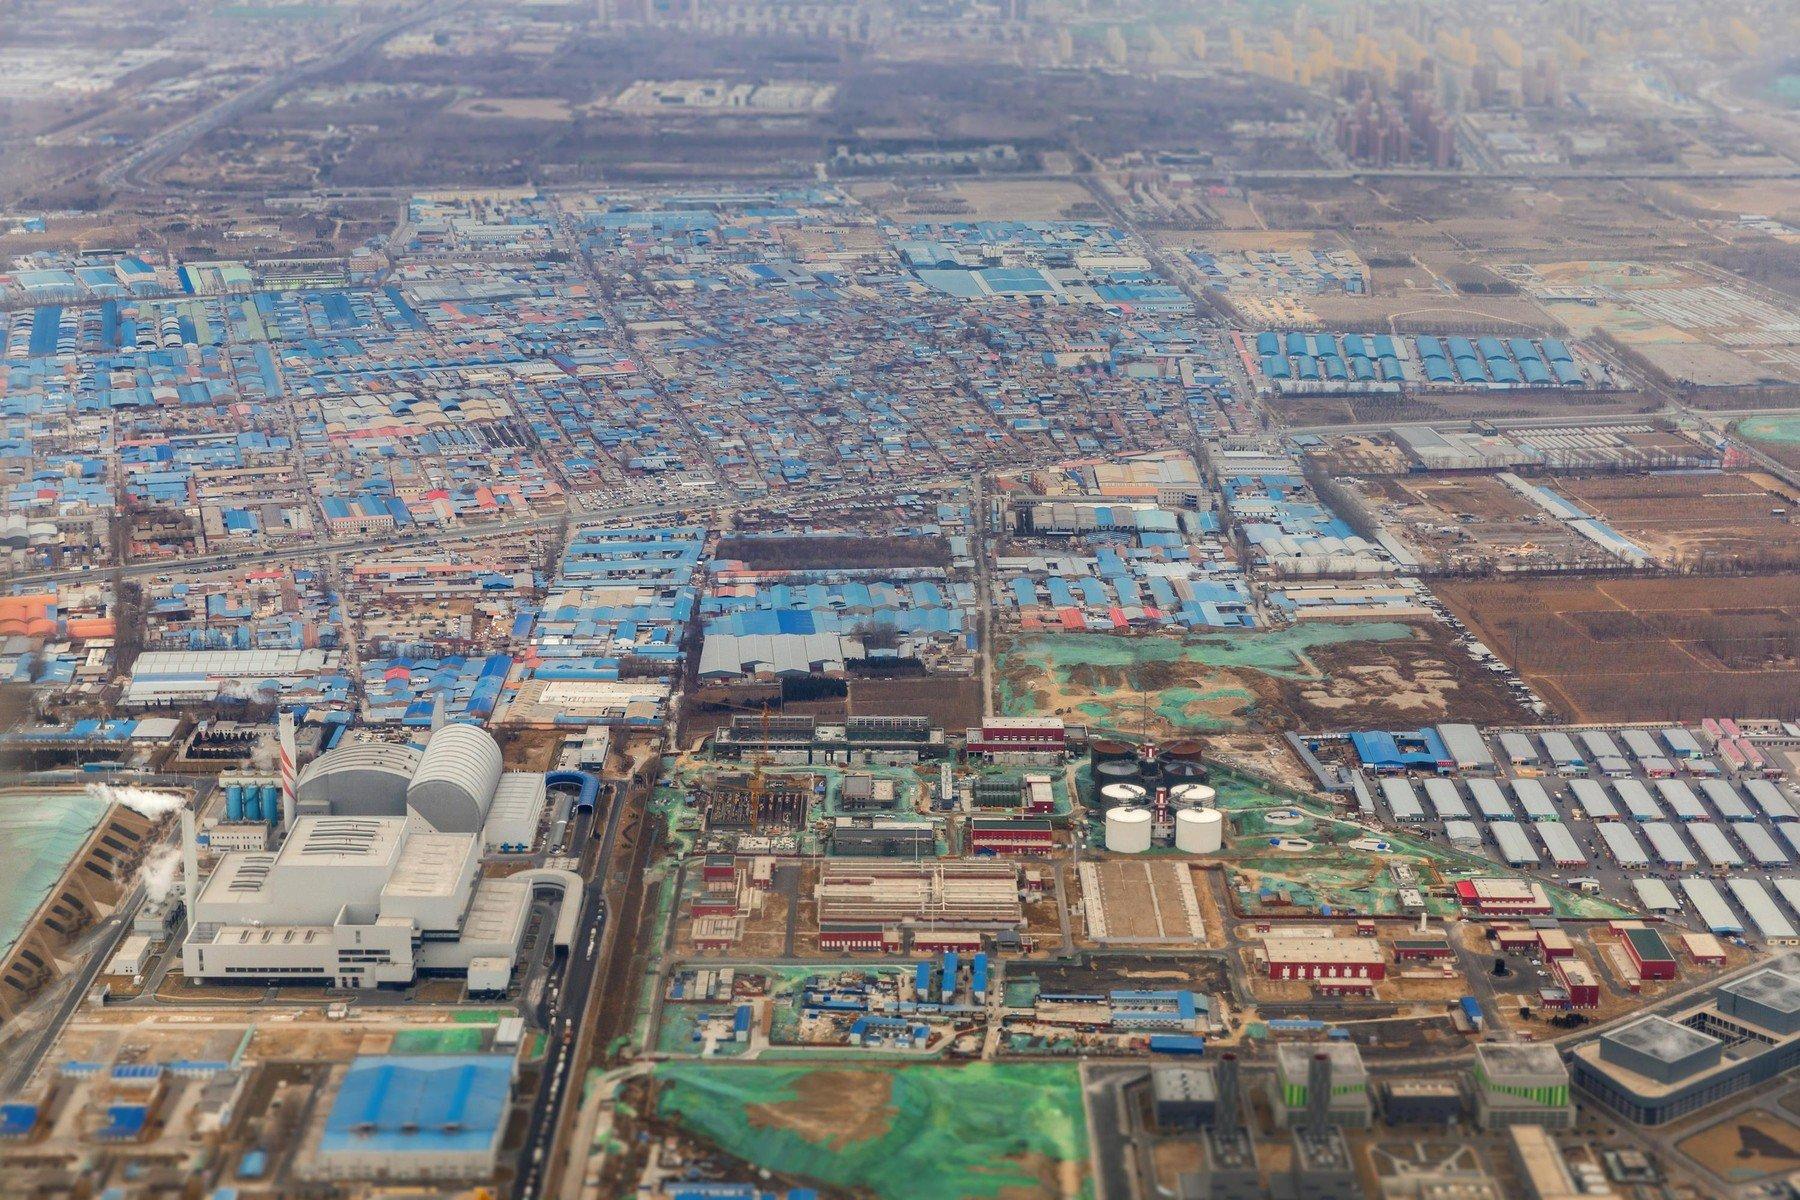 Industrijska zona u blizini Pekinga